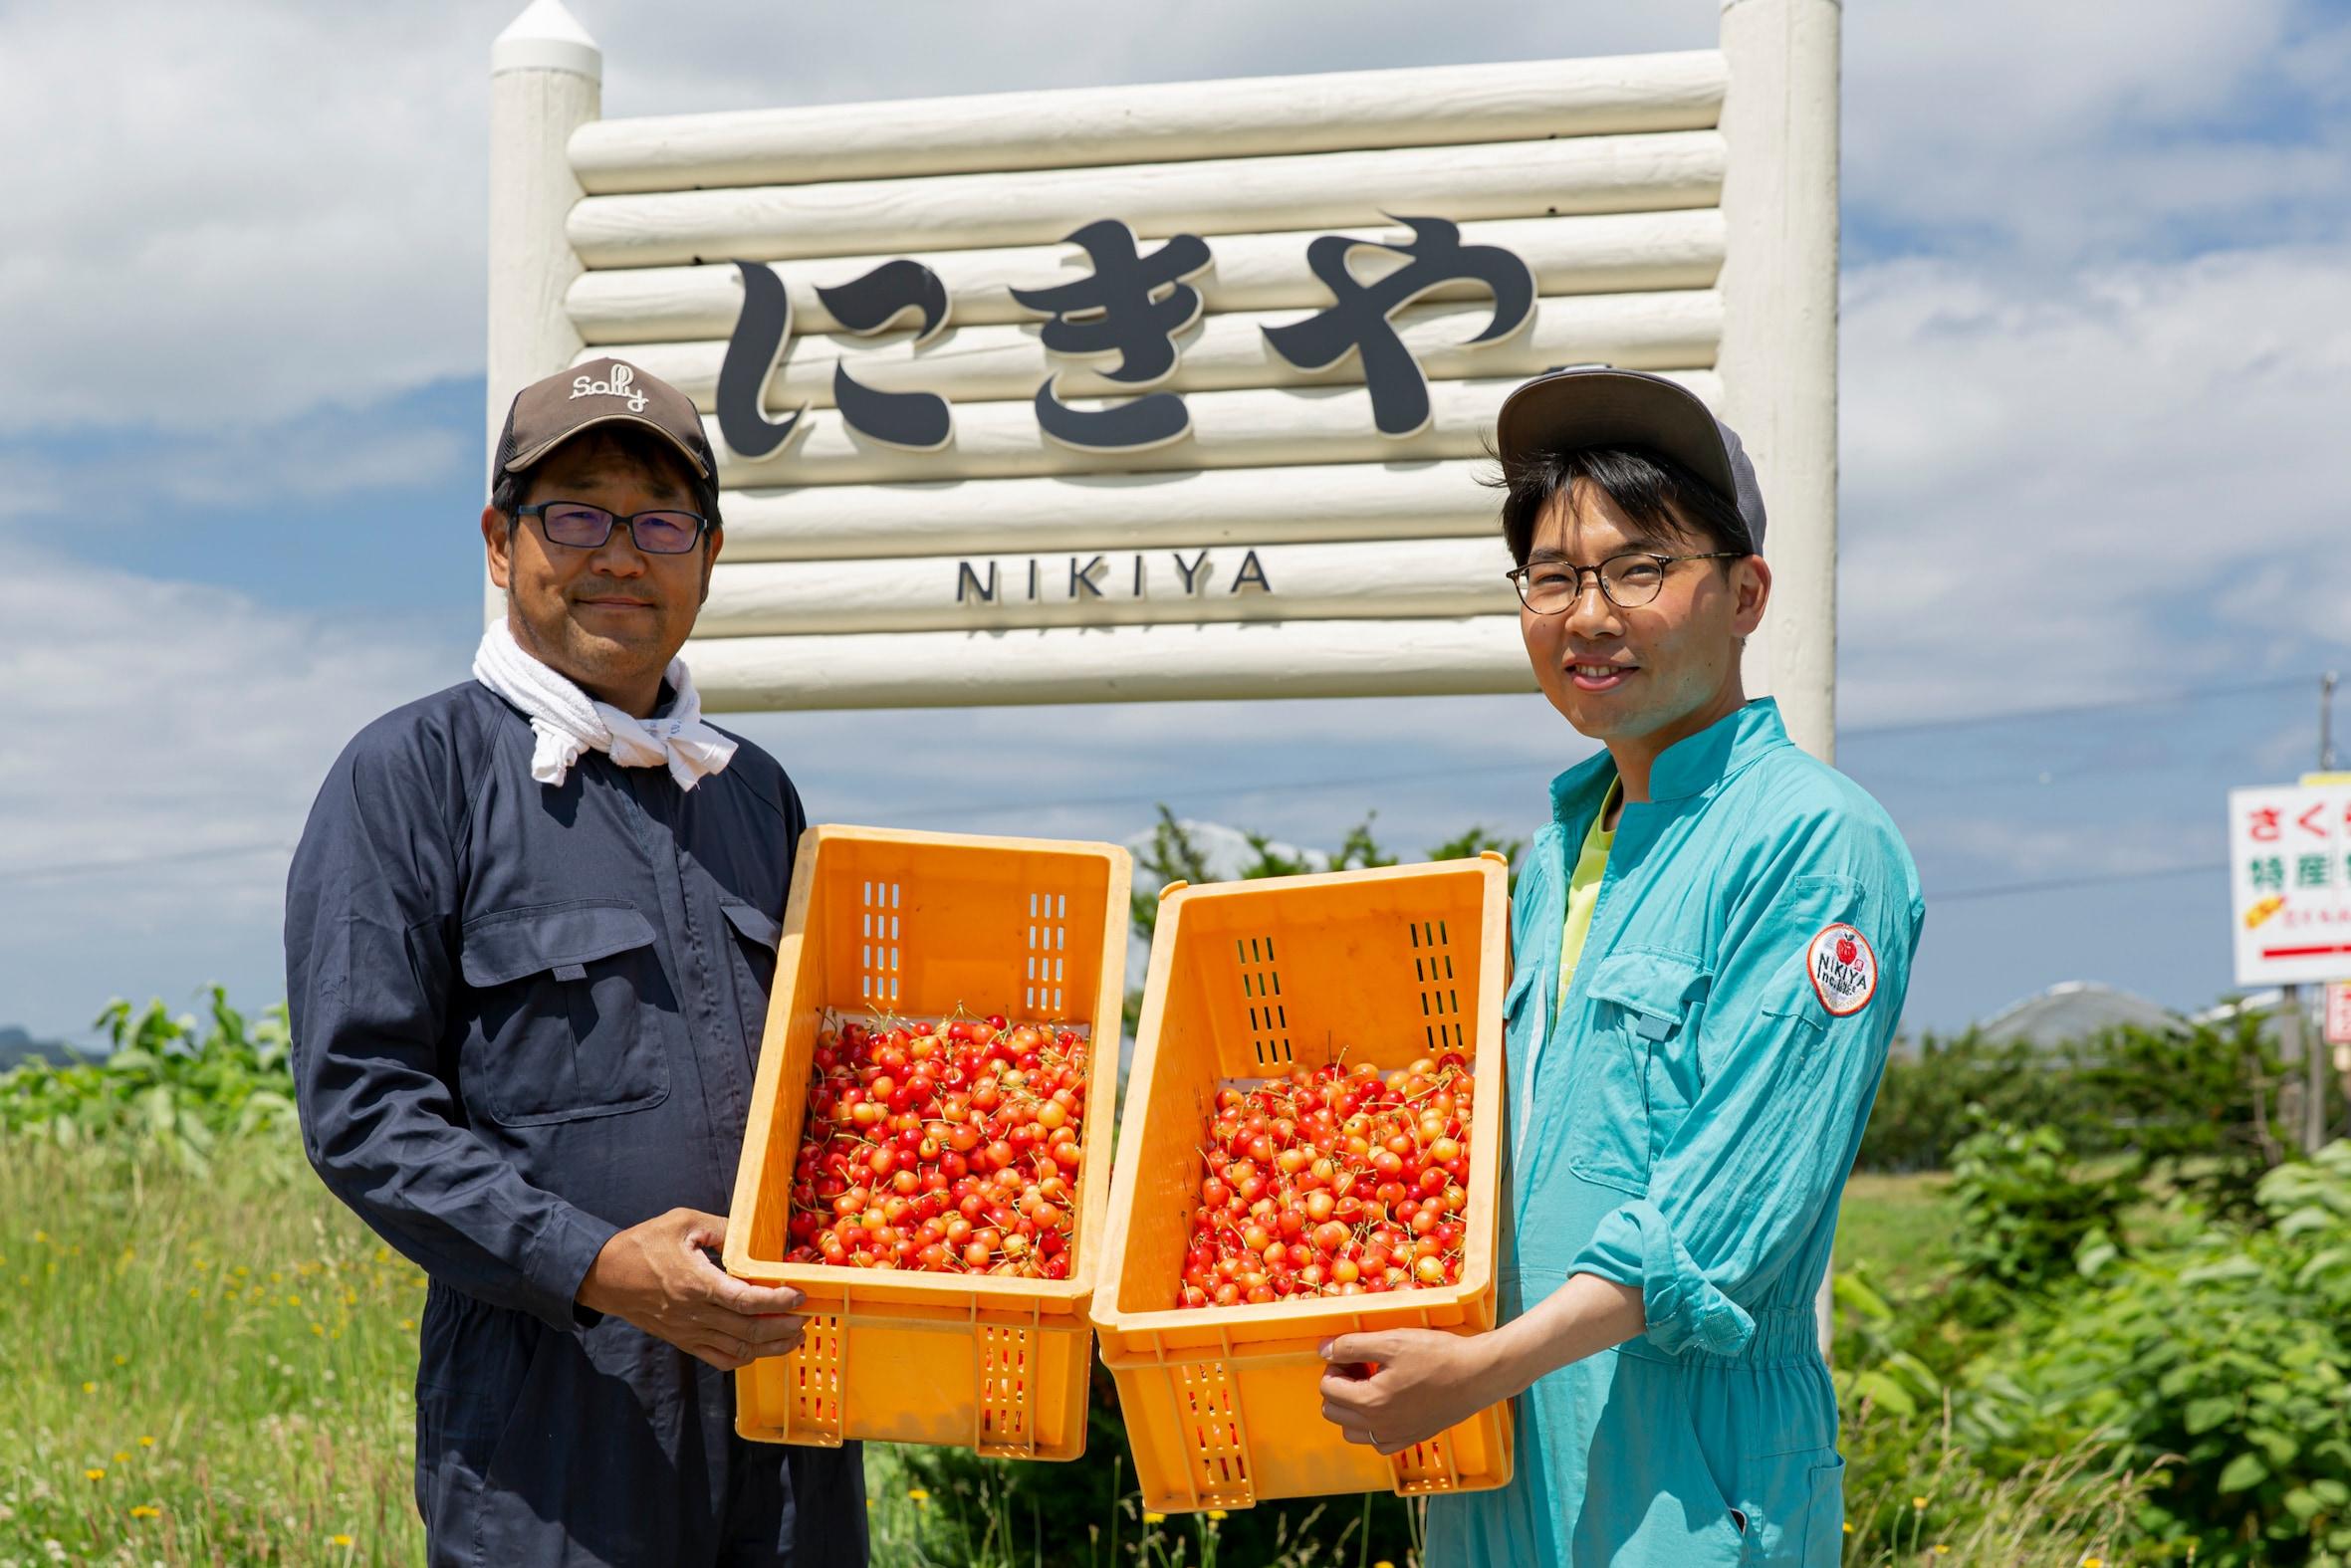 NIKIYA FARM & BREWERY -にきや-の看板の前に立つ小林さんと大木さん